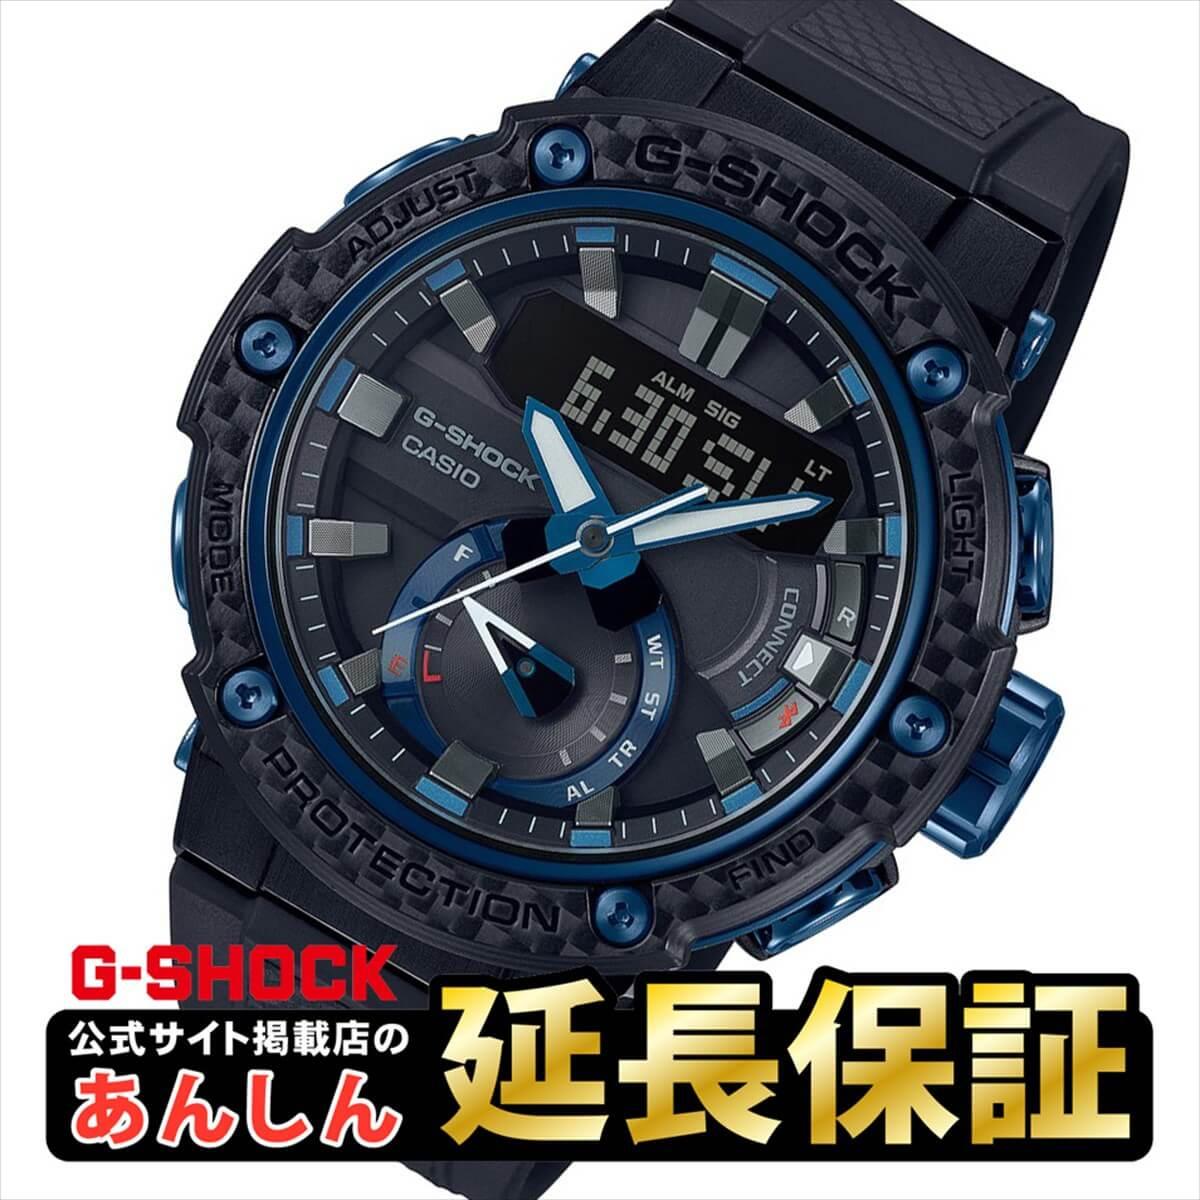 腕時計, メンズ腕時計  G GST-B200X-1A2JF G-STEEL Bluetooth(R) CASIO G-SHOCK 101910spl010p